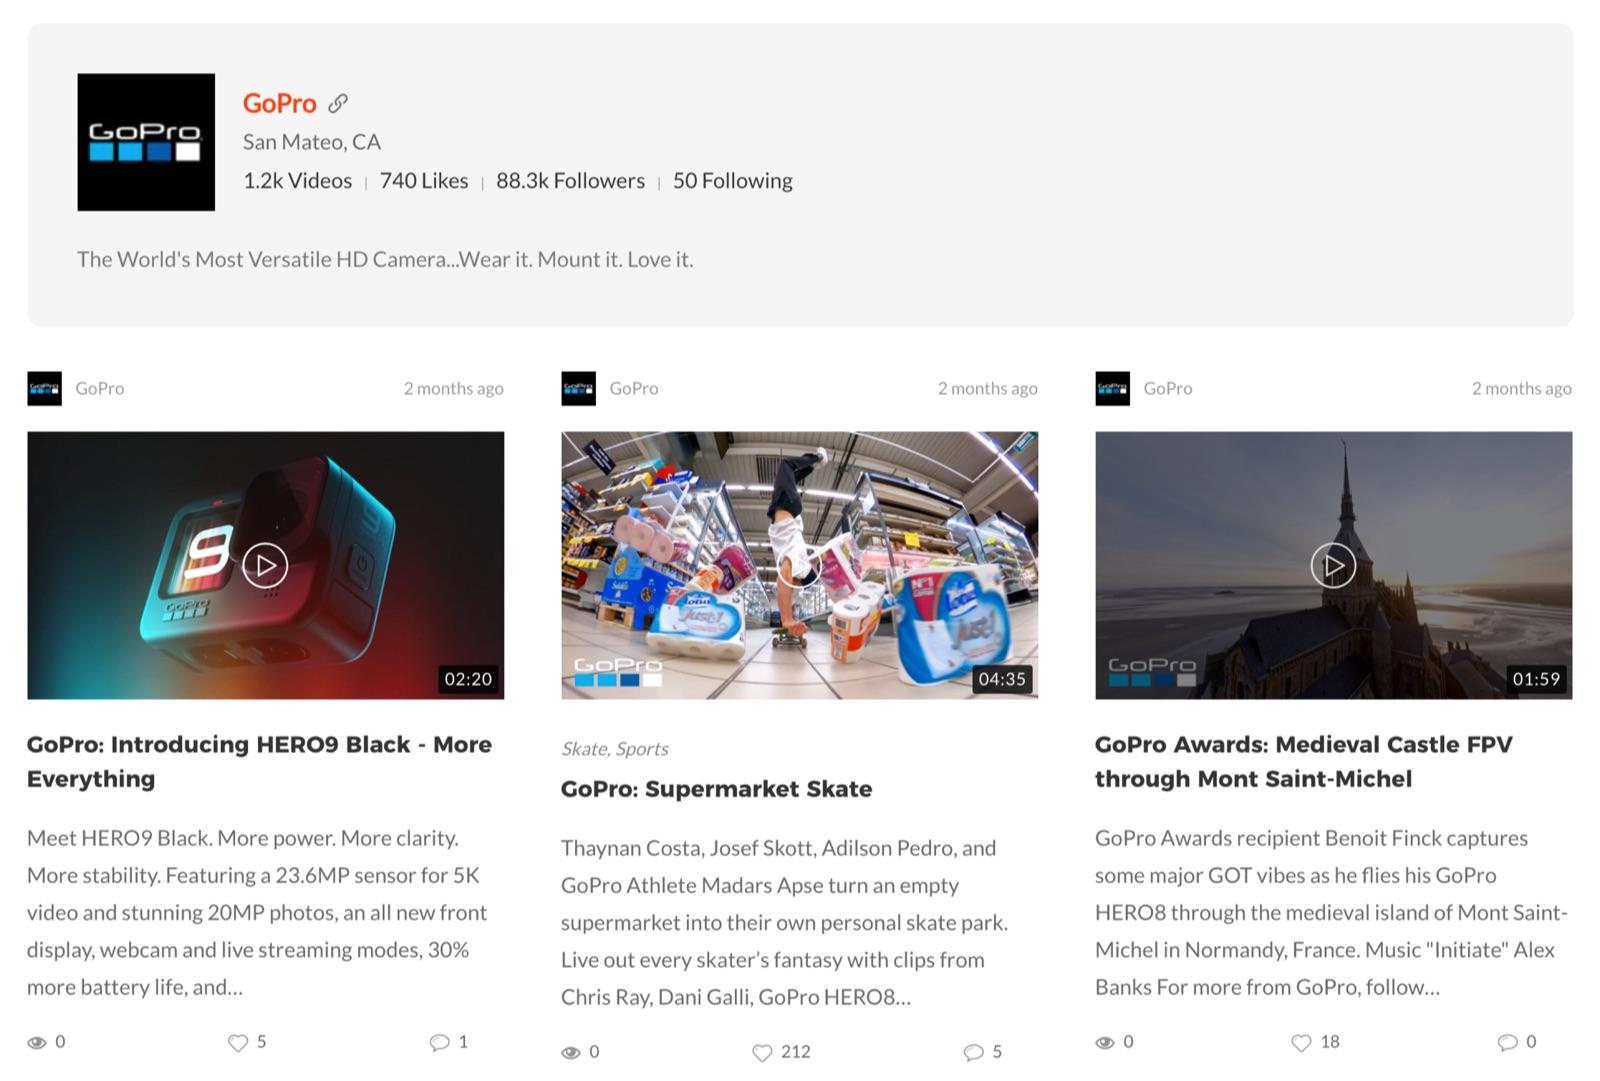 Vimeo Gallery/Grid